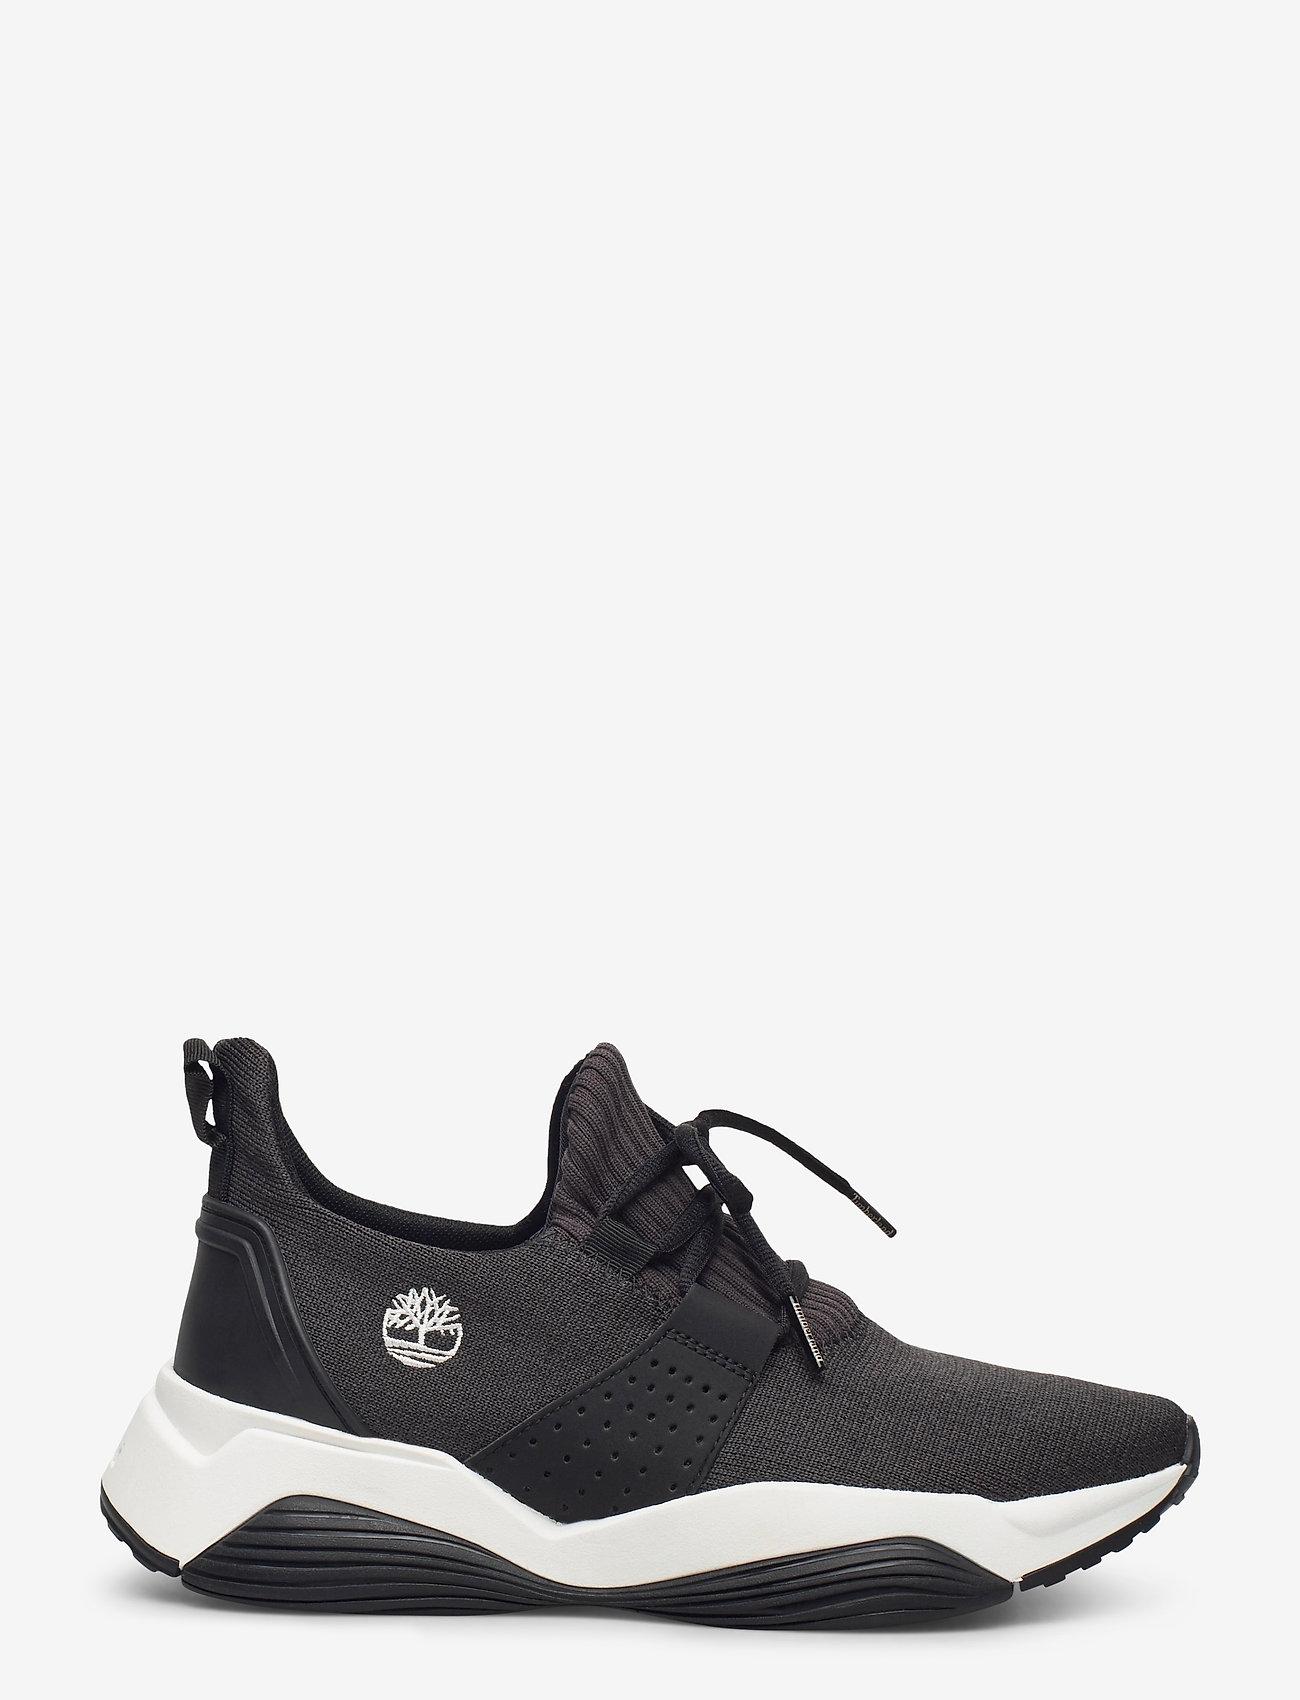 Timberland - EMRLD BAY KNIT BLK - lage sneakers - black - 1